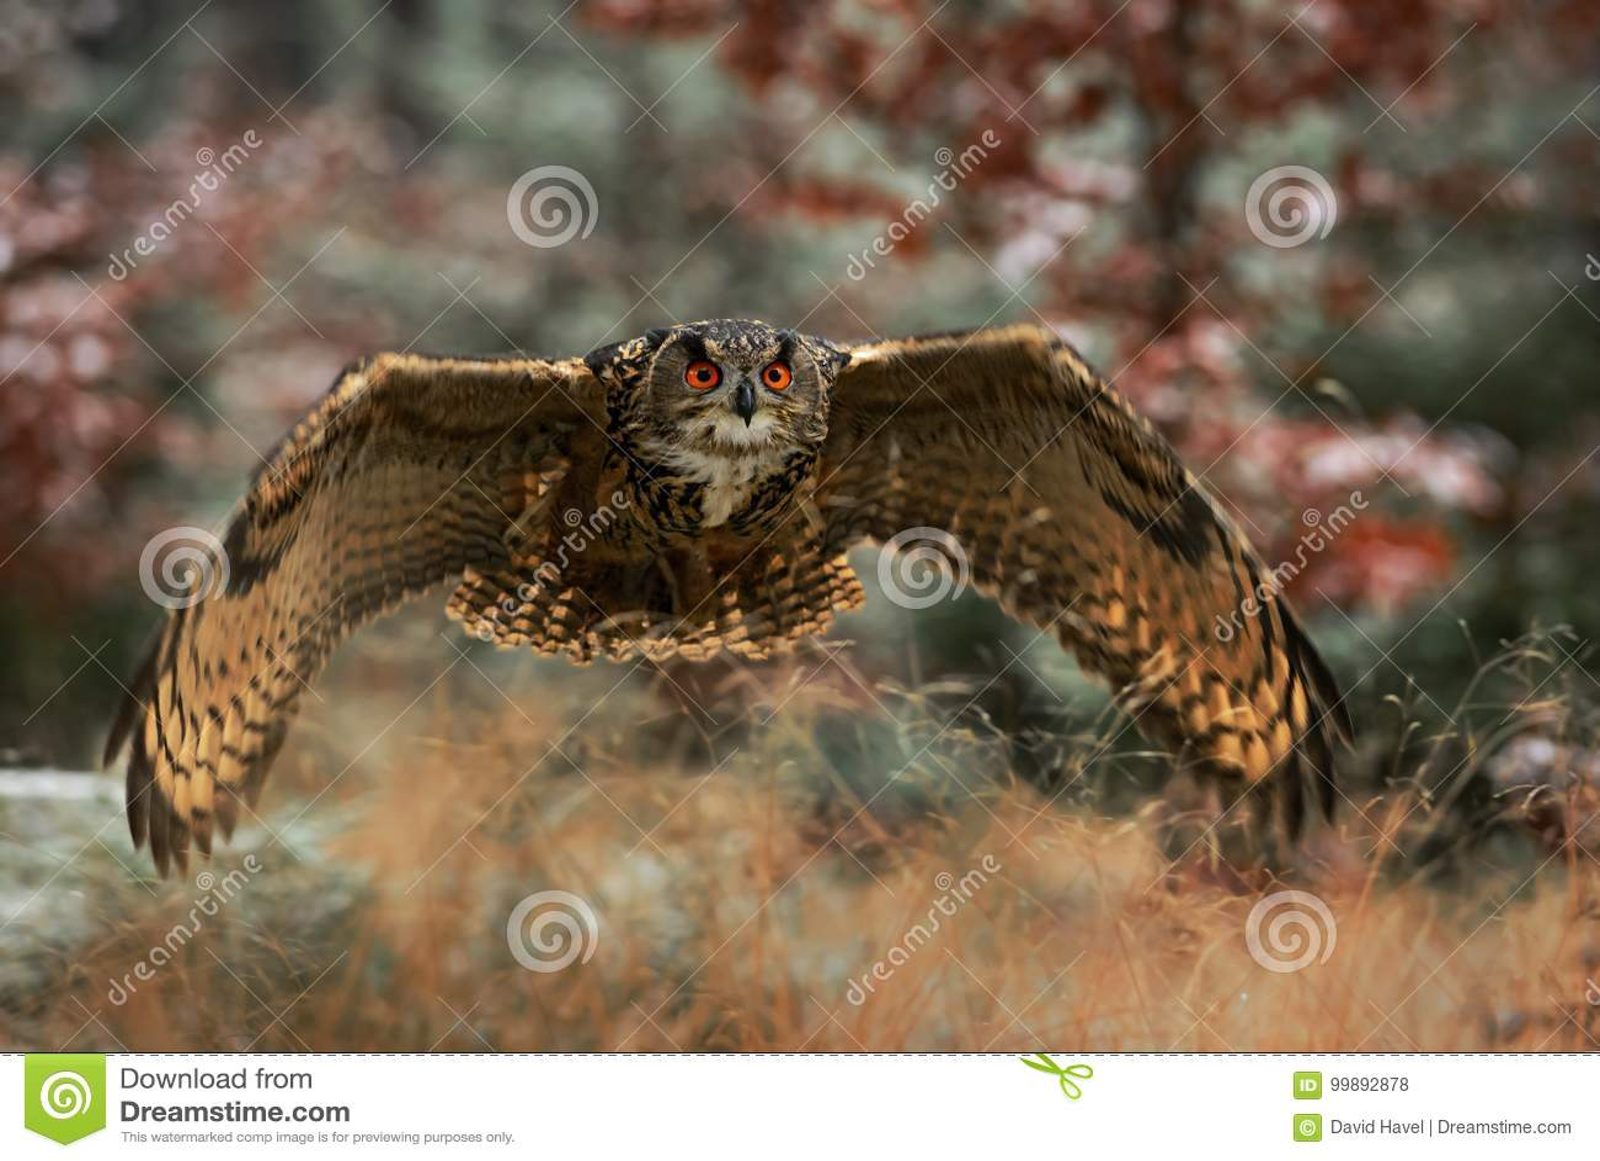 Eurasian Eagle-owl - Bubo bub